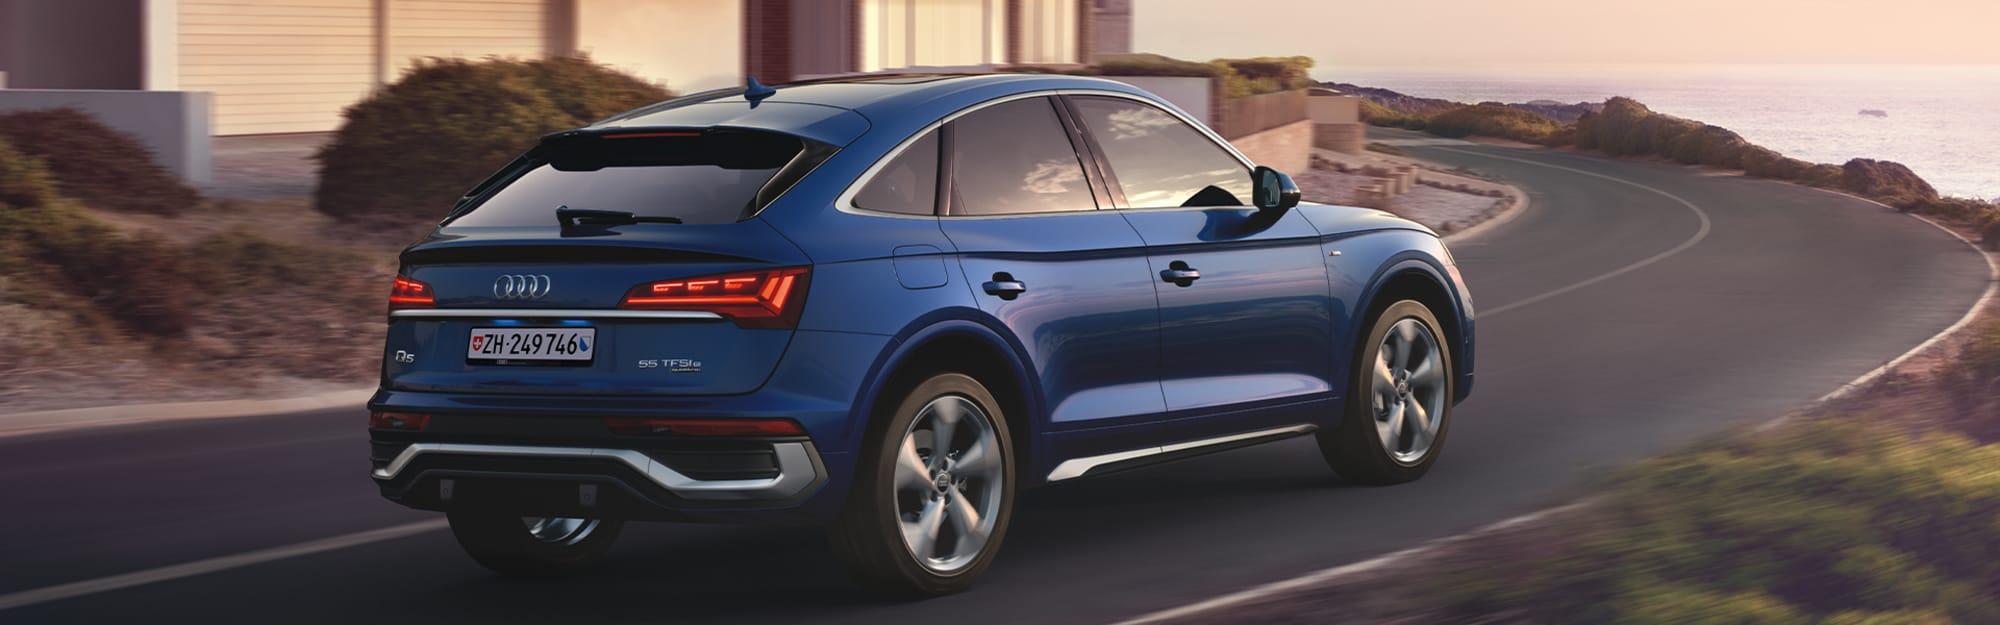 Audi_Q5SB_TFSIe_Fahrend_Haendlerwebseite_1920x600px_d